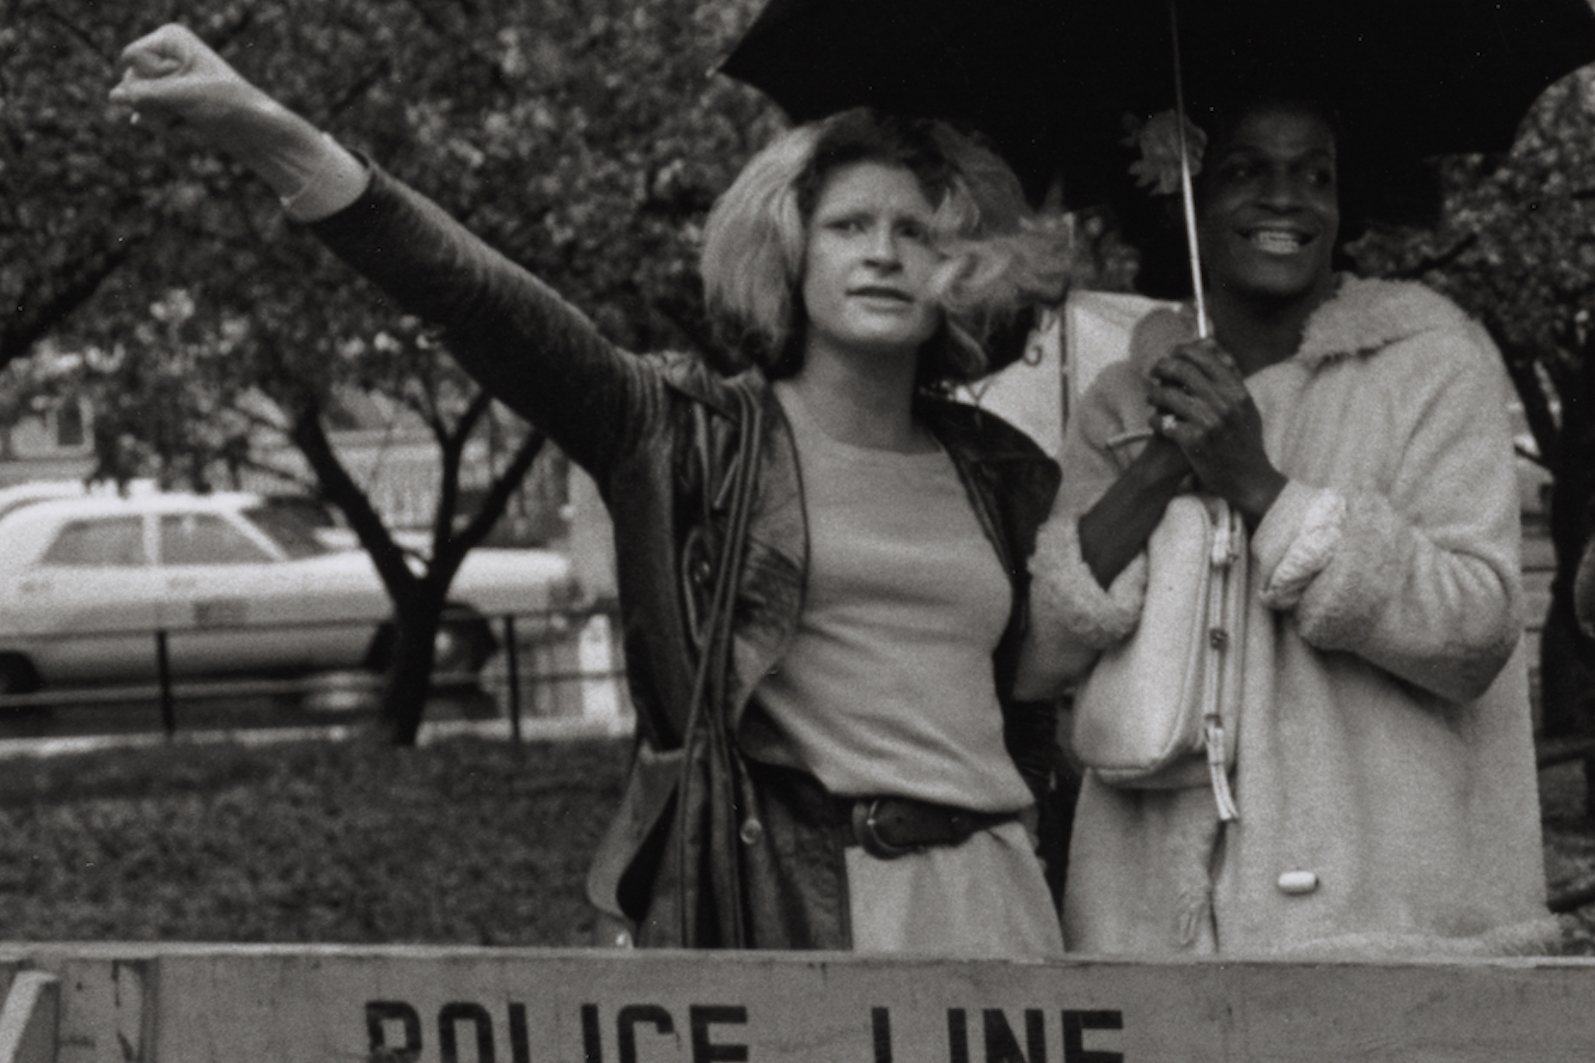 Stonewall at 50: Transgender activists Marsha P. Johnson and Sylvia Rivera  are getting a statue in New York City - The Washington Post